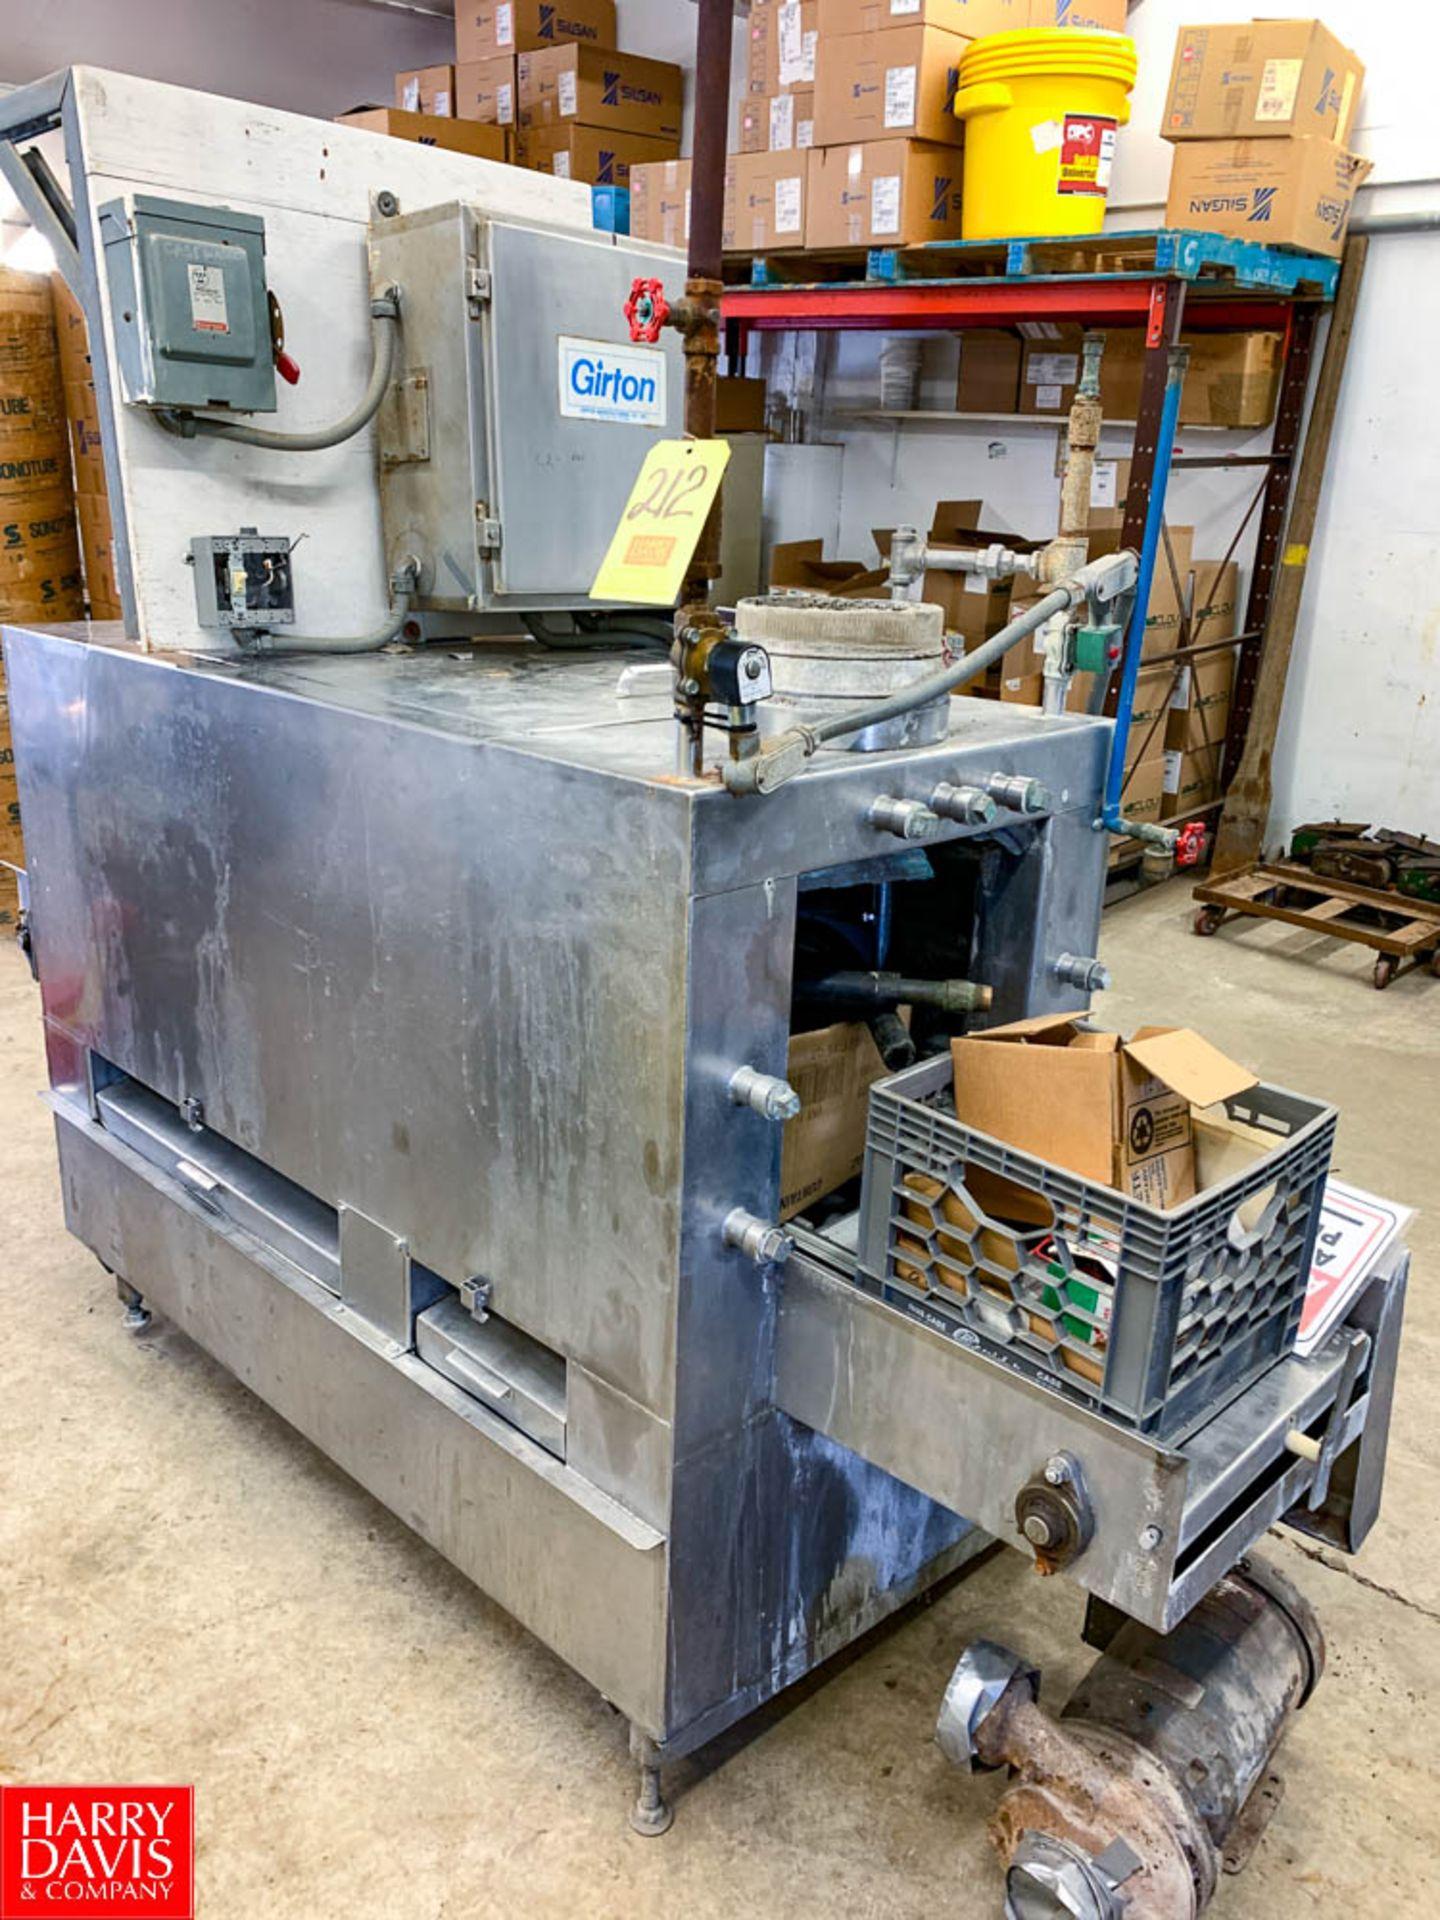 Girton S/S Case Washer Model: GC 10 , S/N: 97012001